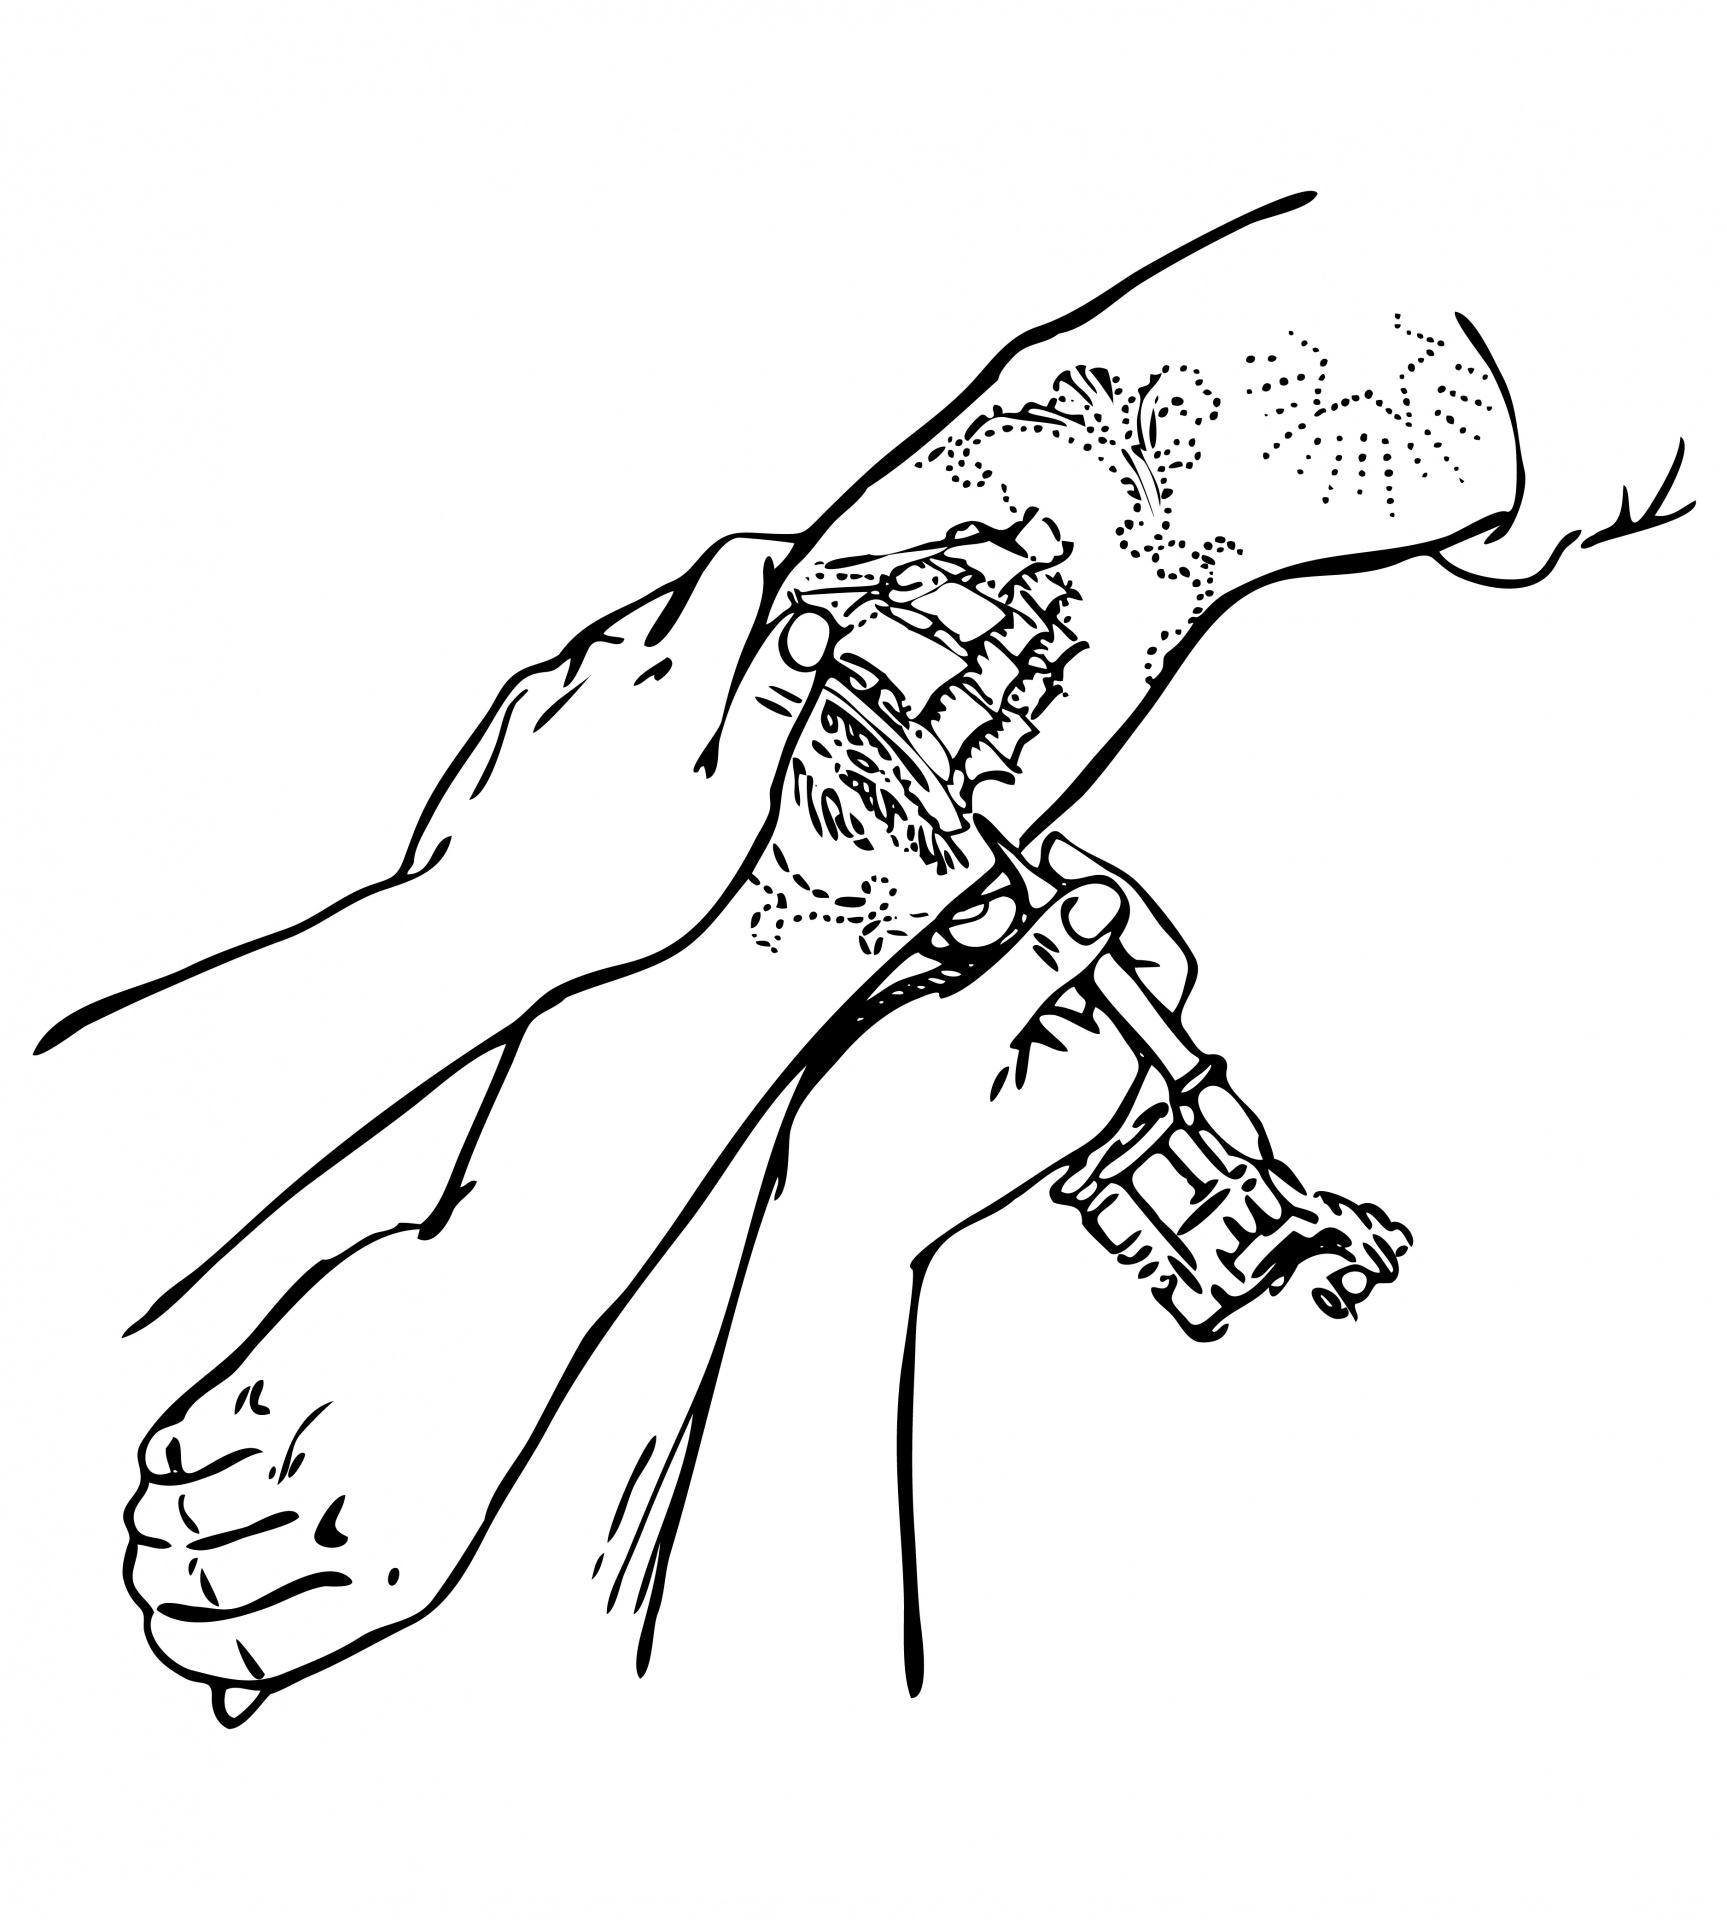 Tattoo Clipart Illustration Free Stock Photo